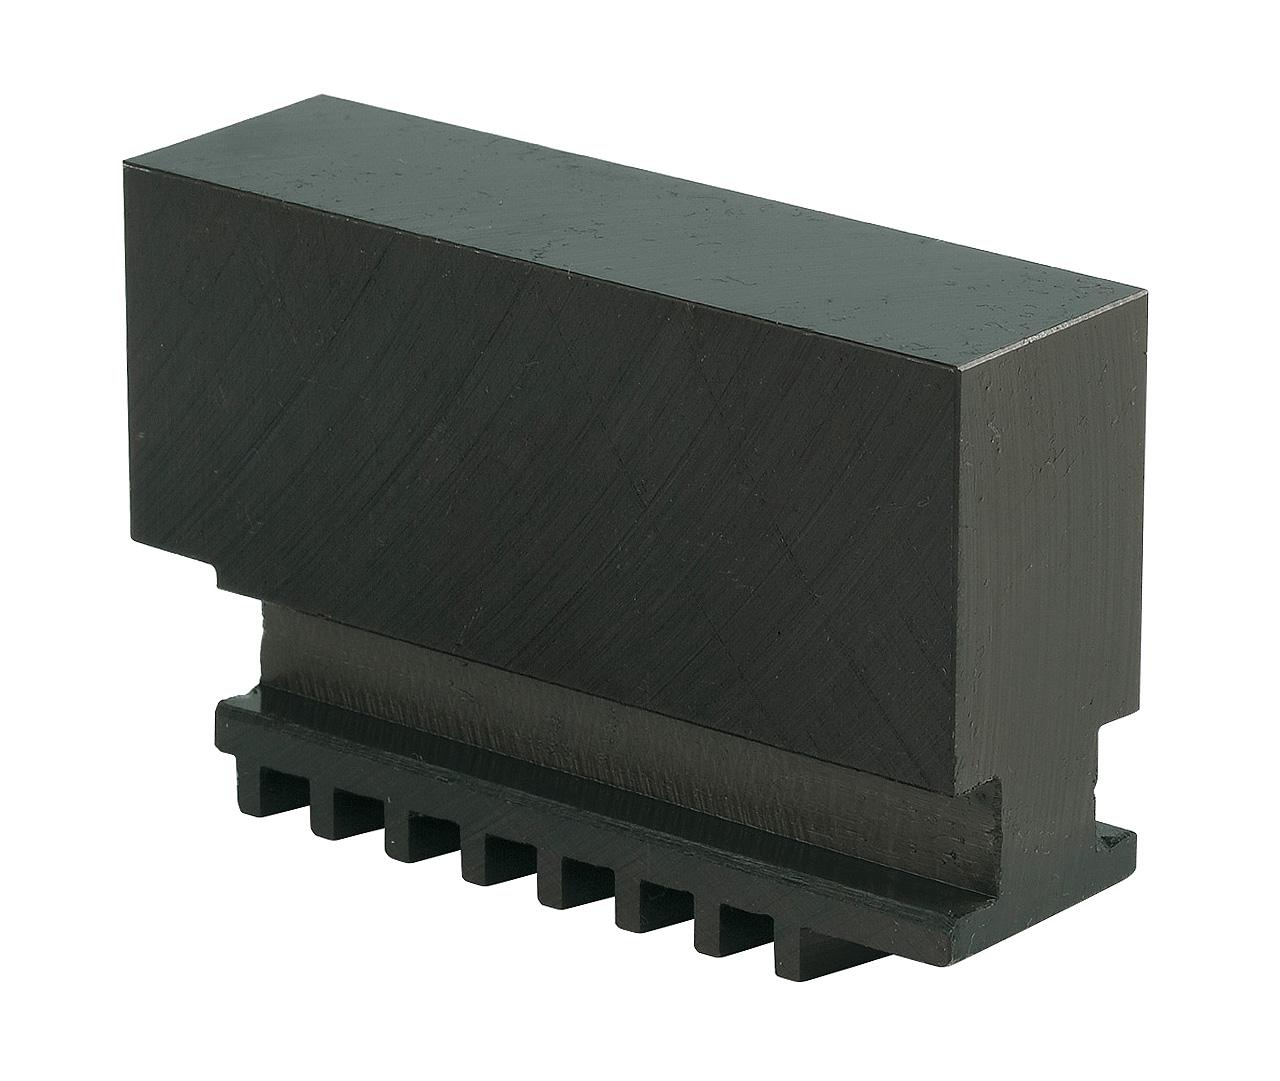 Szczęki jednolite miękkie - komplet SJ-PS3-315 BERNARDO